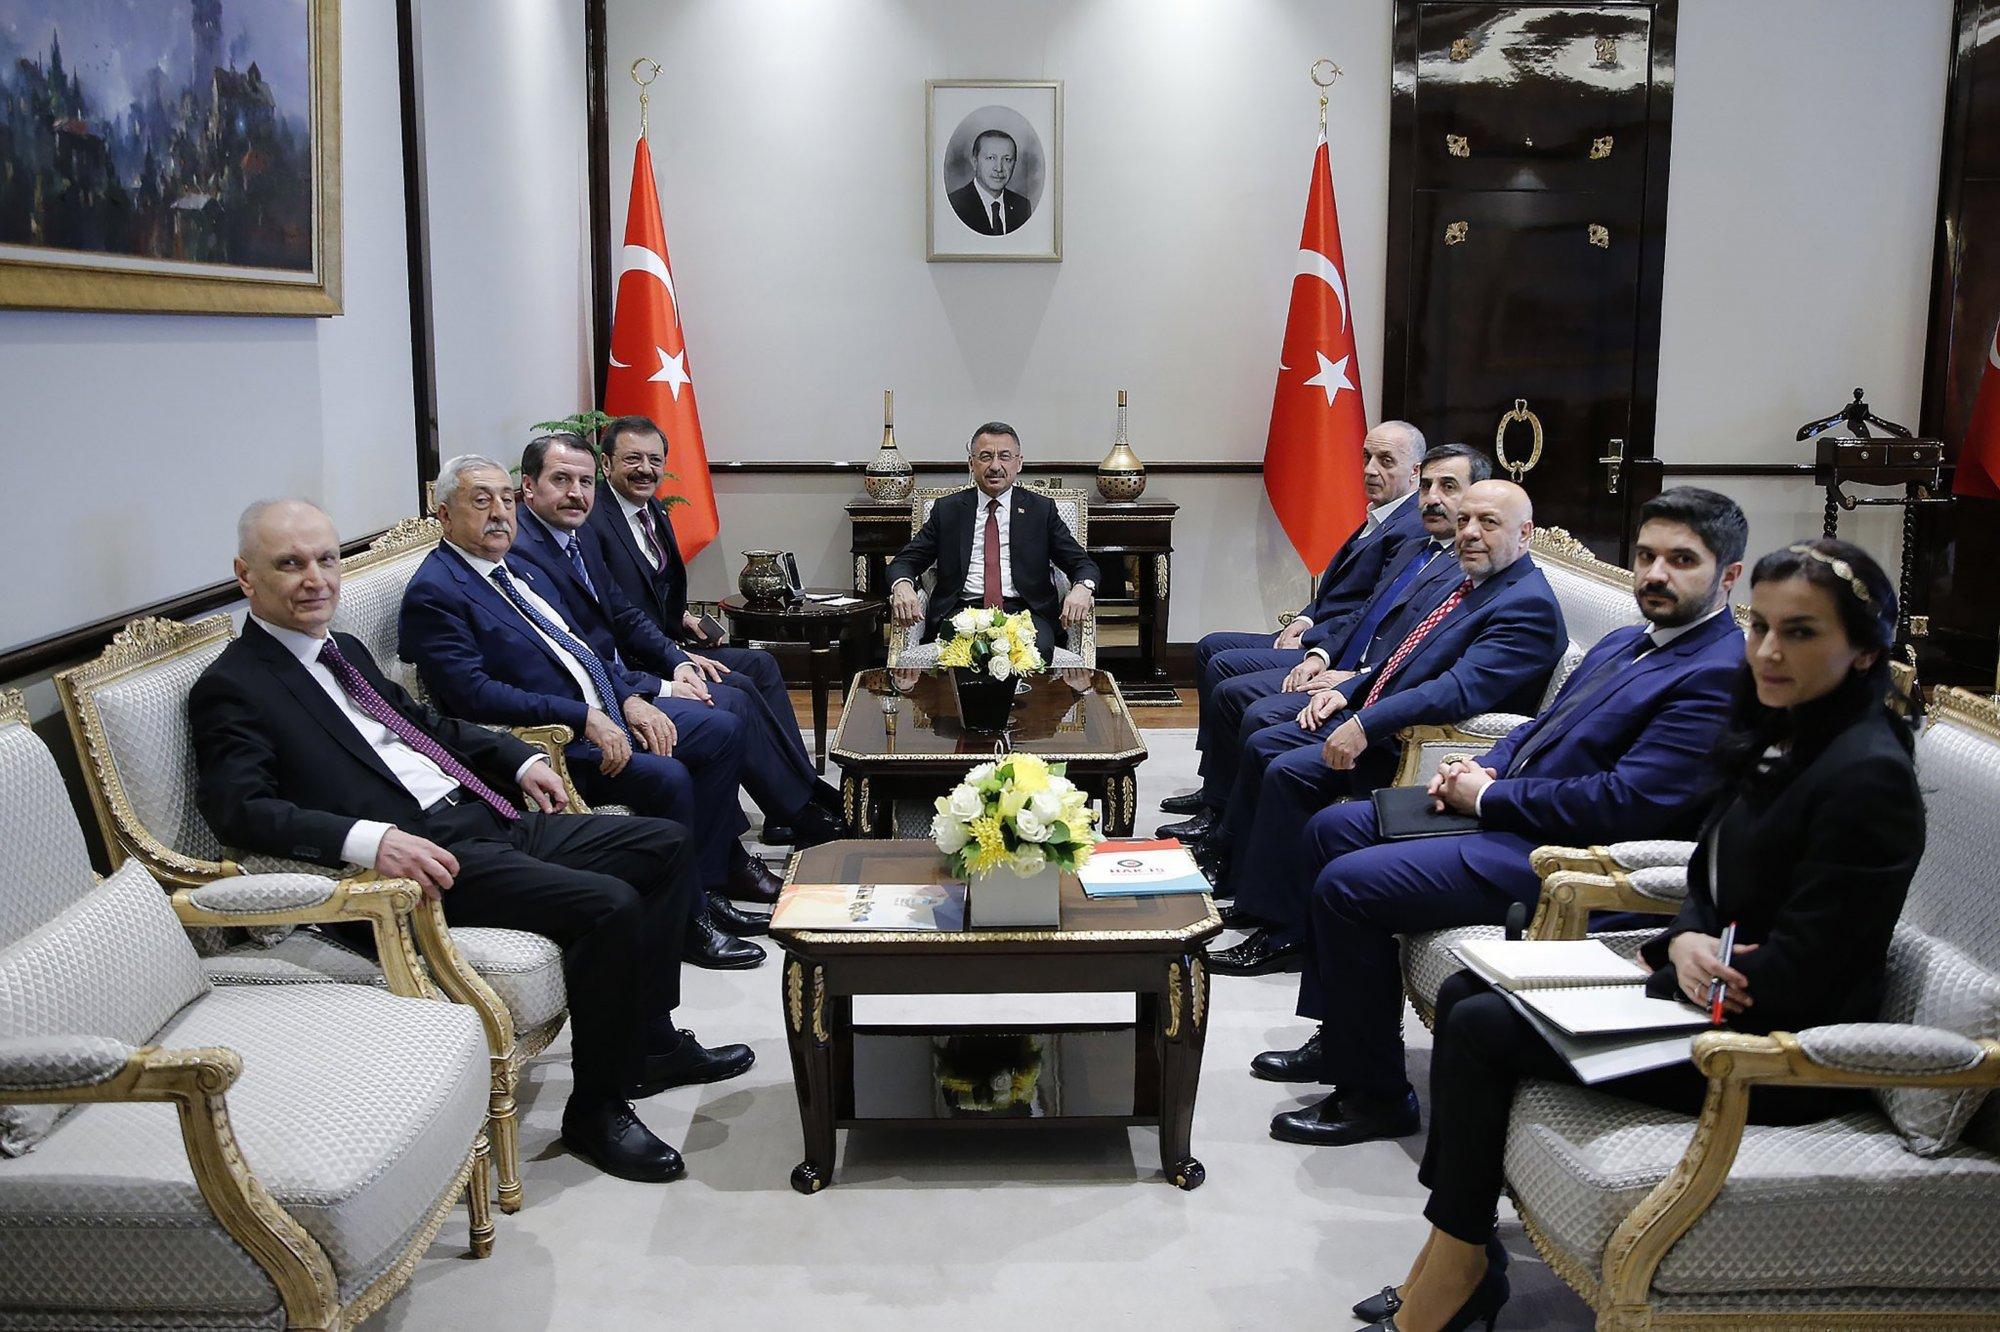 AB KİK HEYETİNDEN CUMHURBAŞKANI YARDIMCISI OKTAY'A ZİYARET